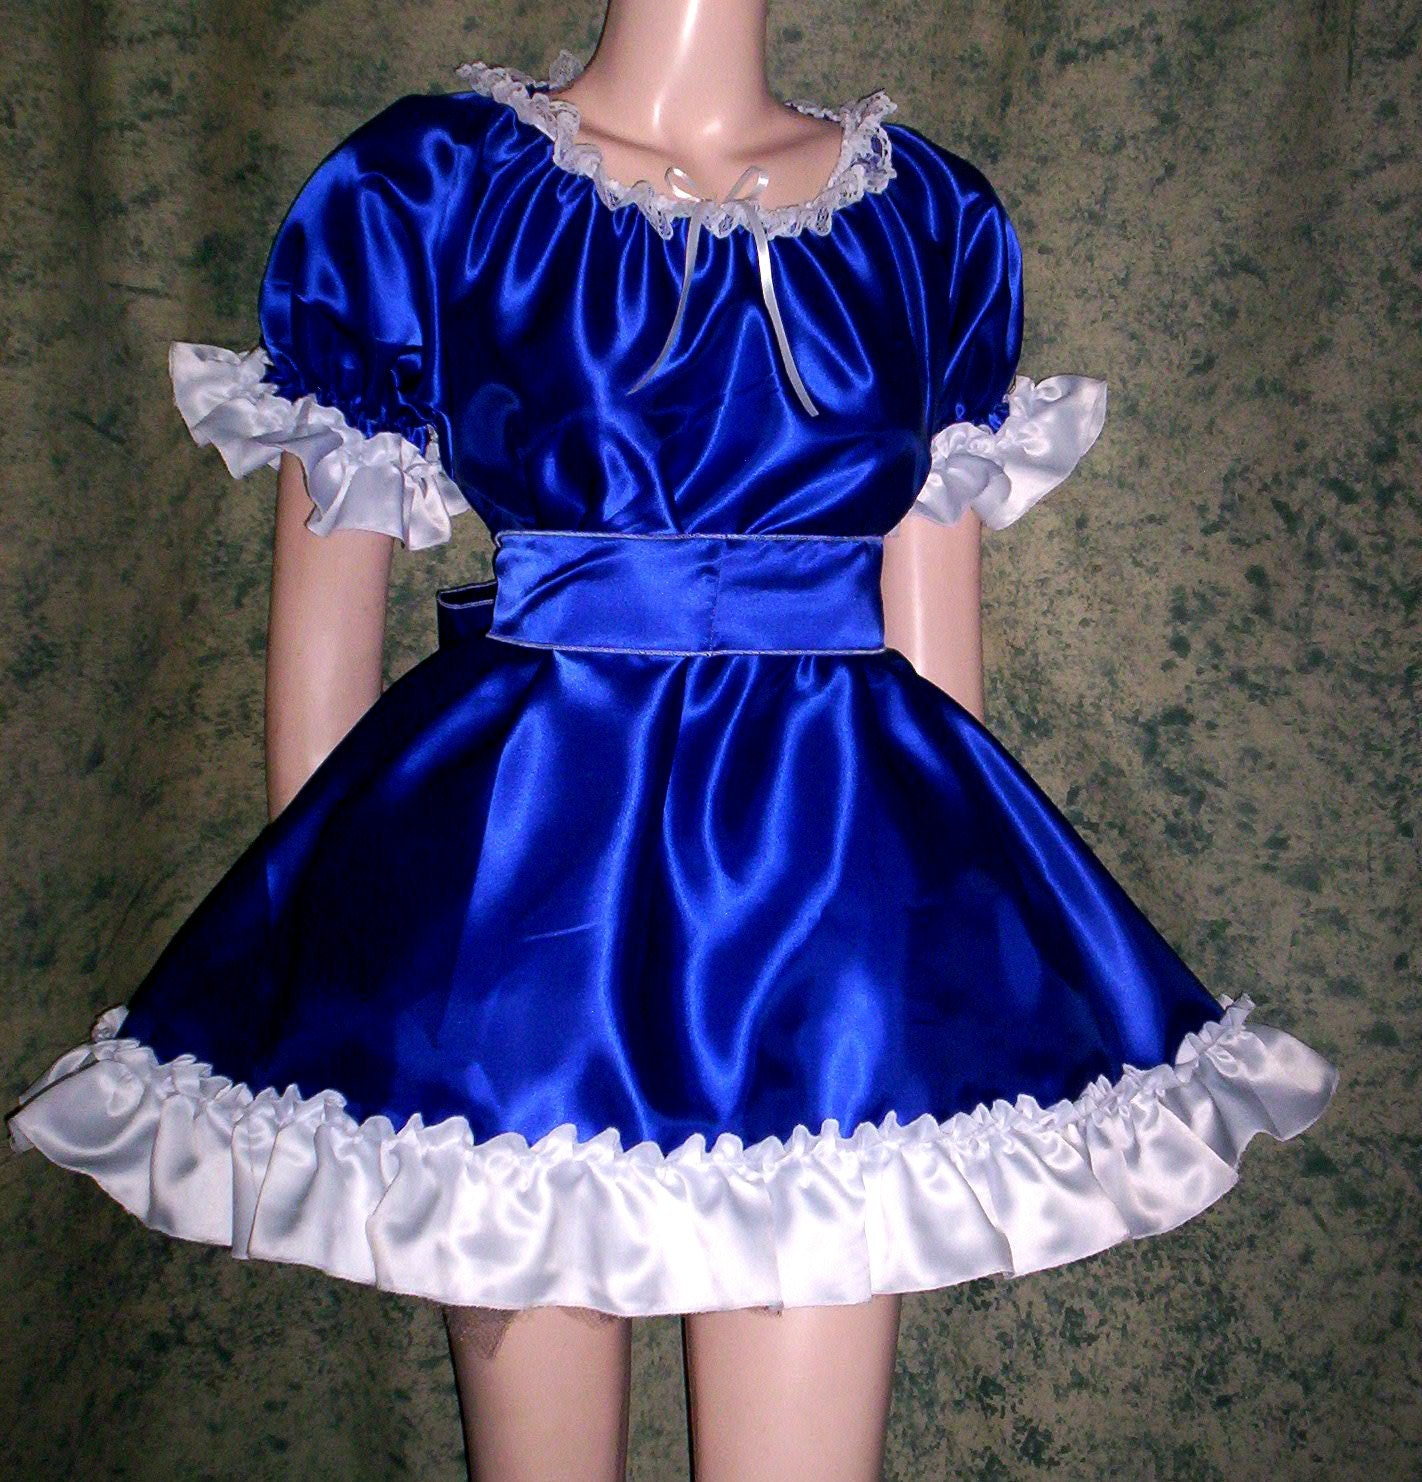 Sissy Dress - The Fantasy Store, Sexy Fantasywear!